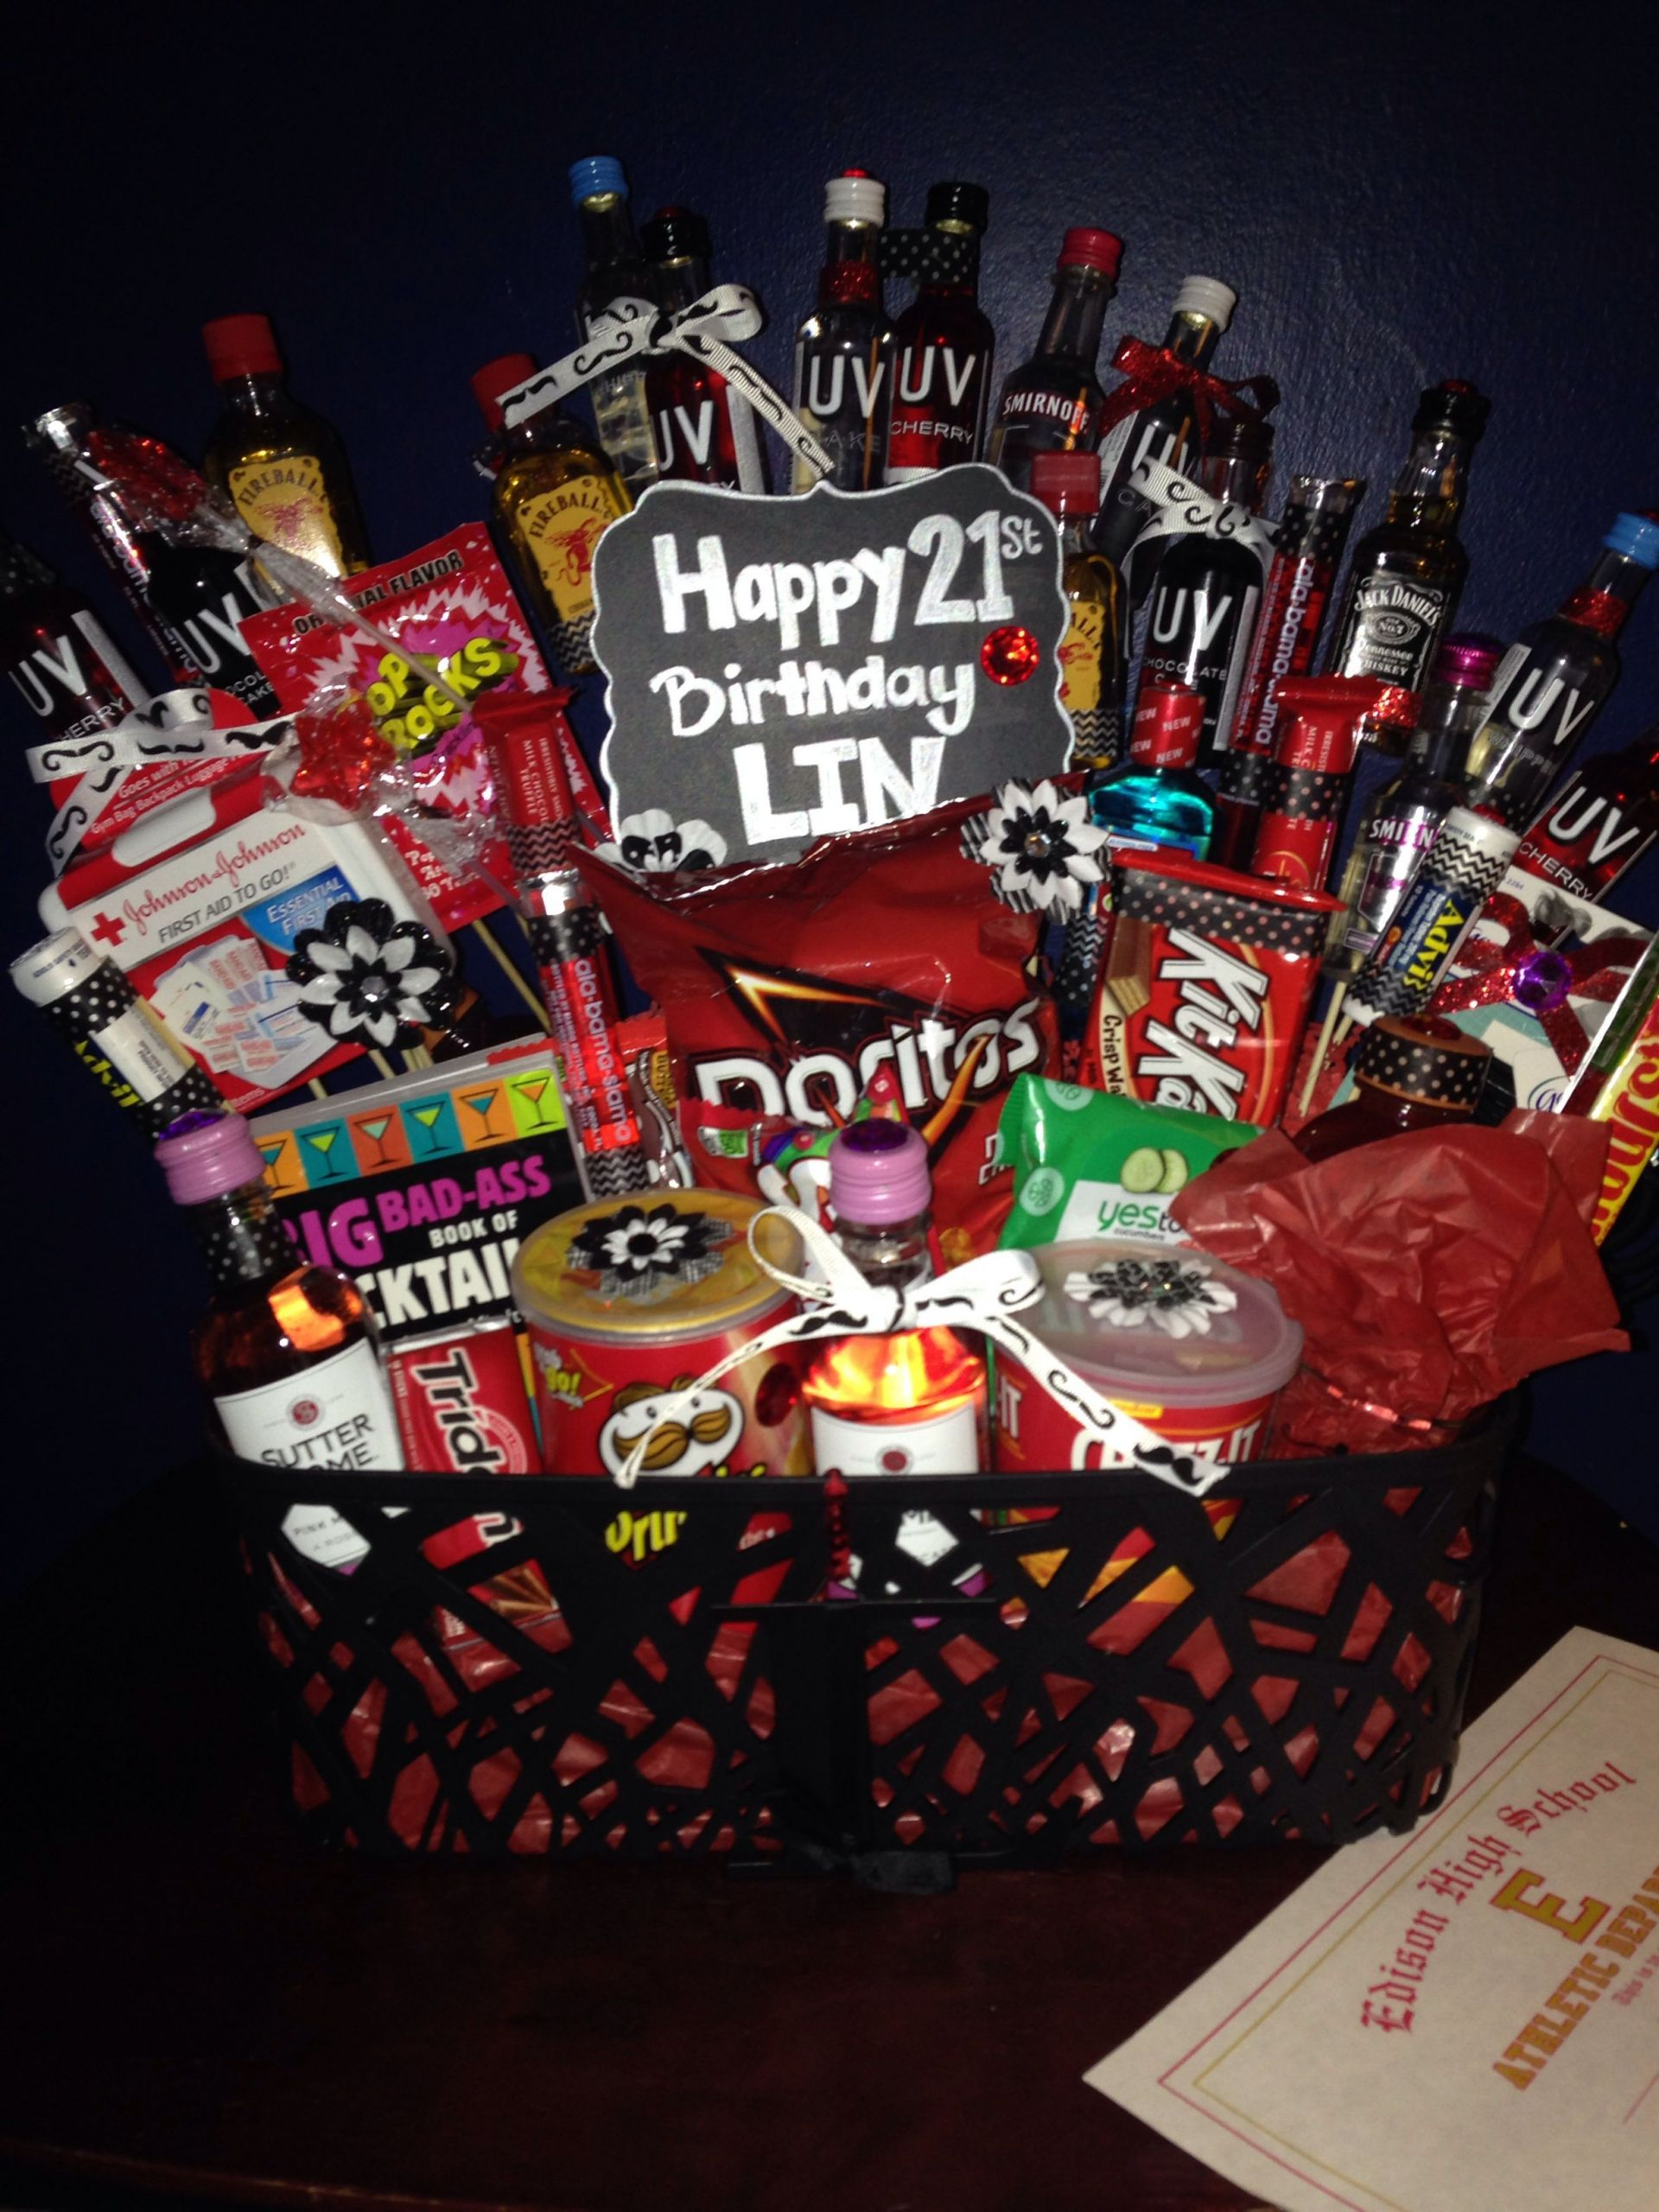 Gift Basket Ideas For Friends Birthday  21st birthday basket